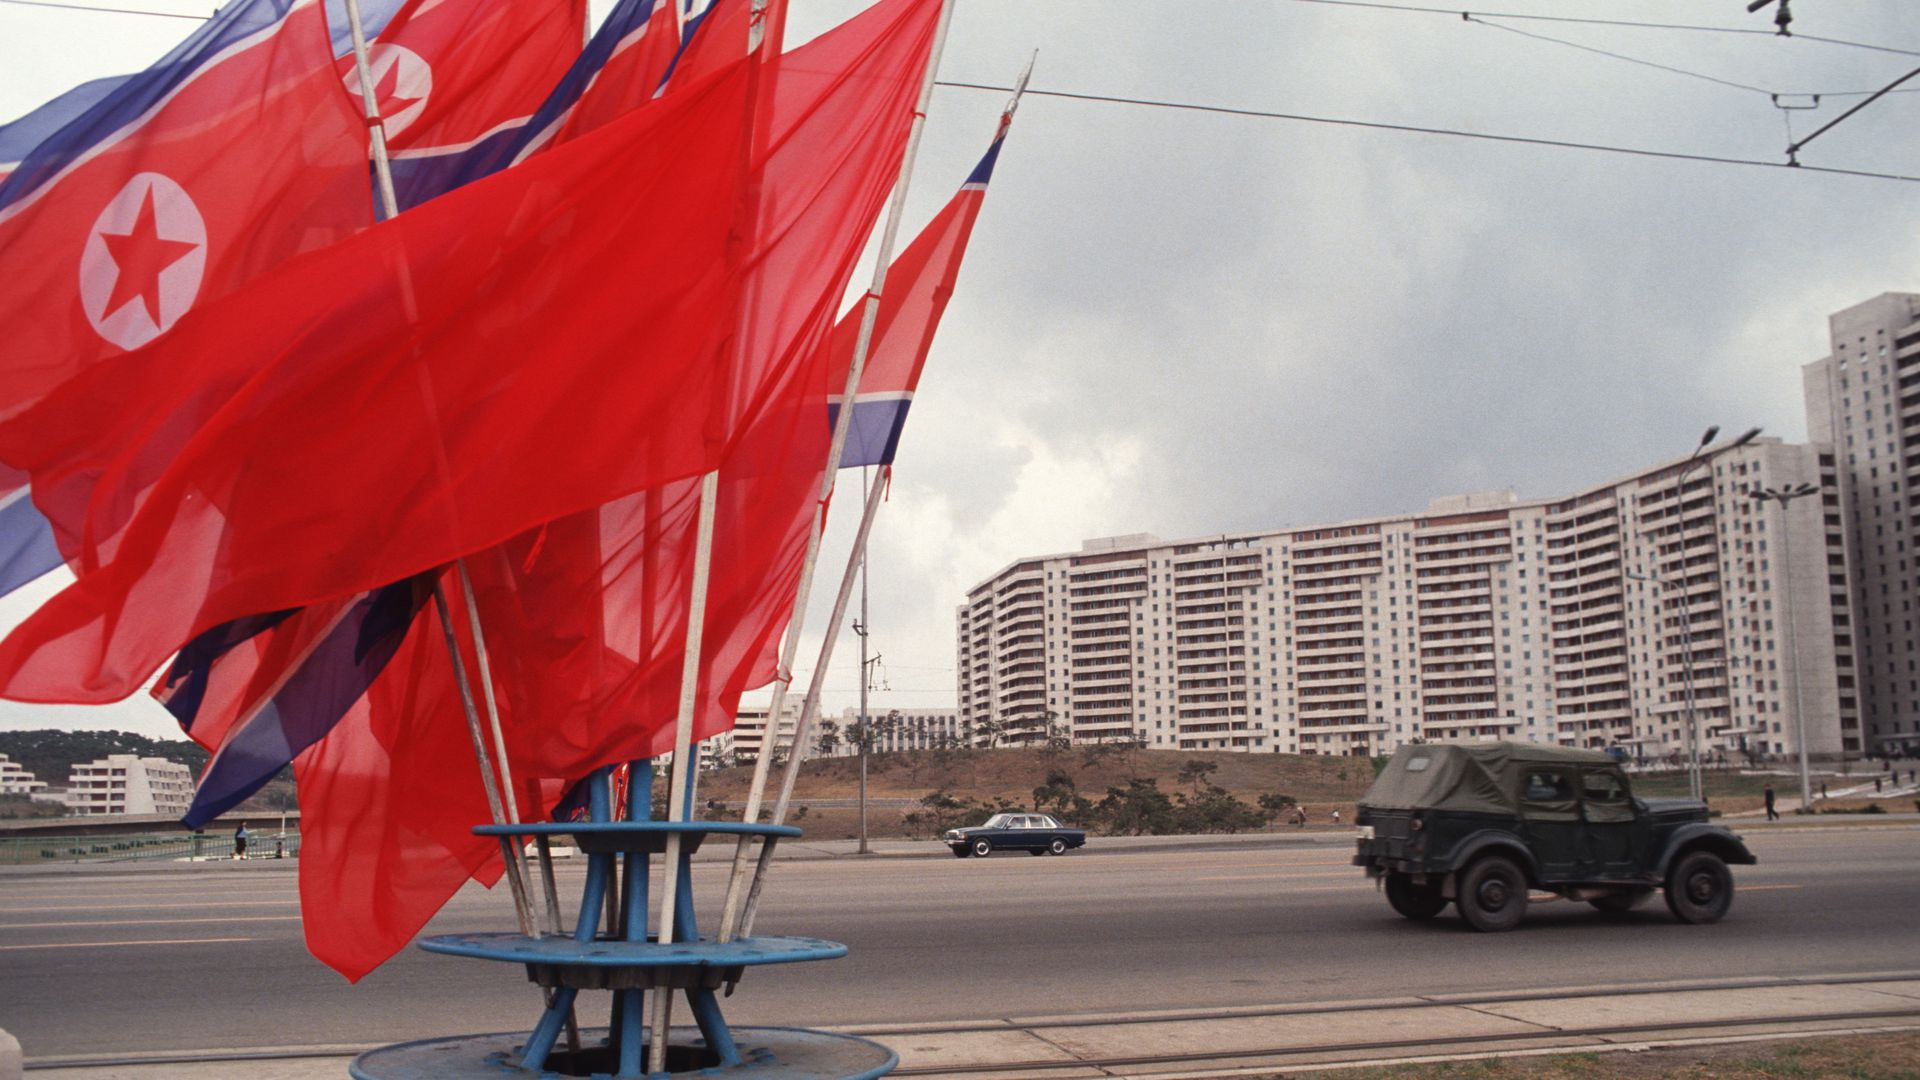 Kwangbok Street in Pyongyang.